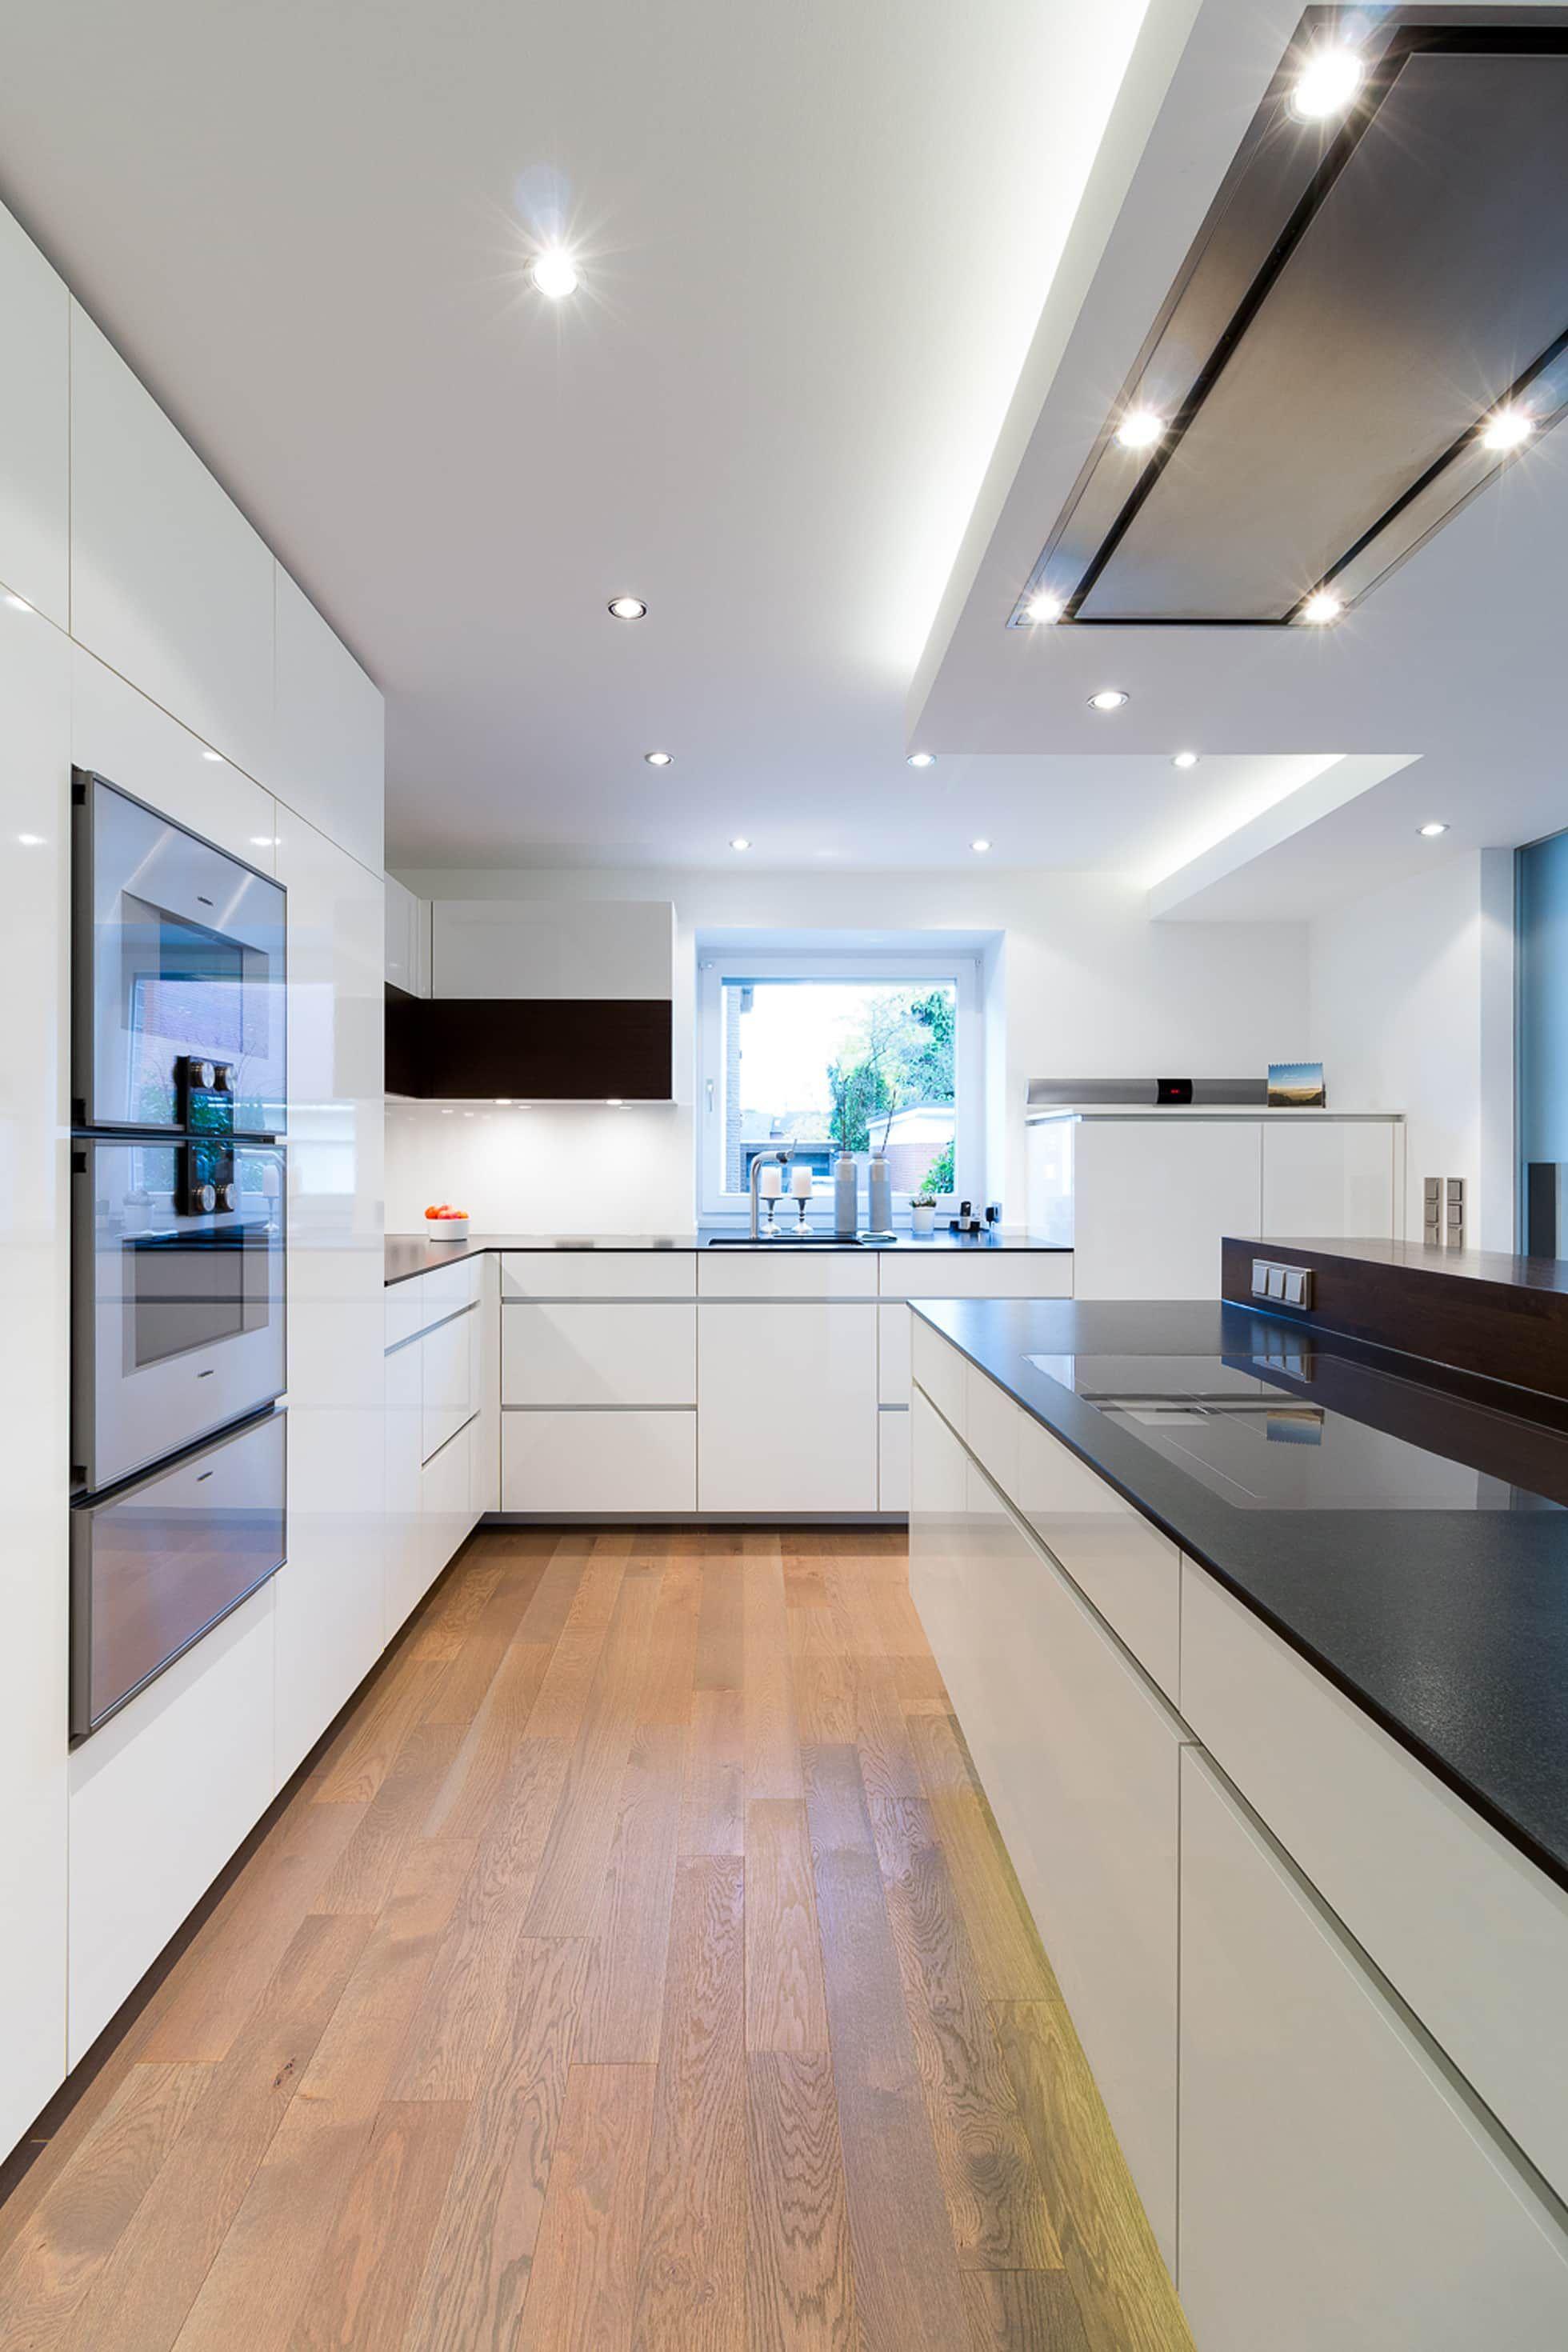 Photo of Cucina abitabile su misura in cucine moderne in corteccia di klocke möbelwerkstätte gmbh modern | homify